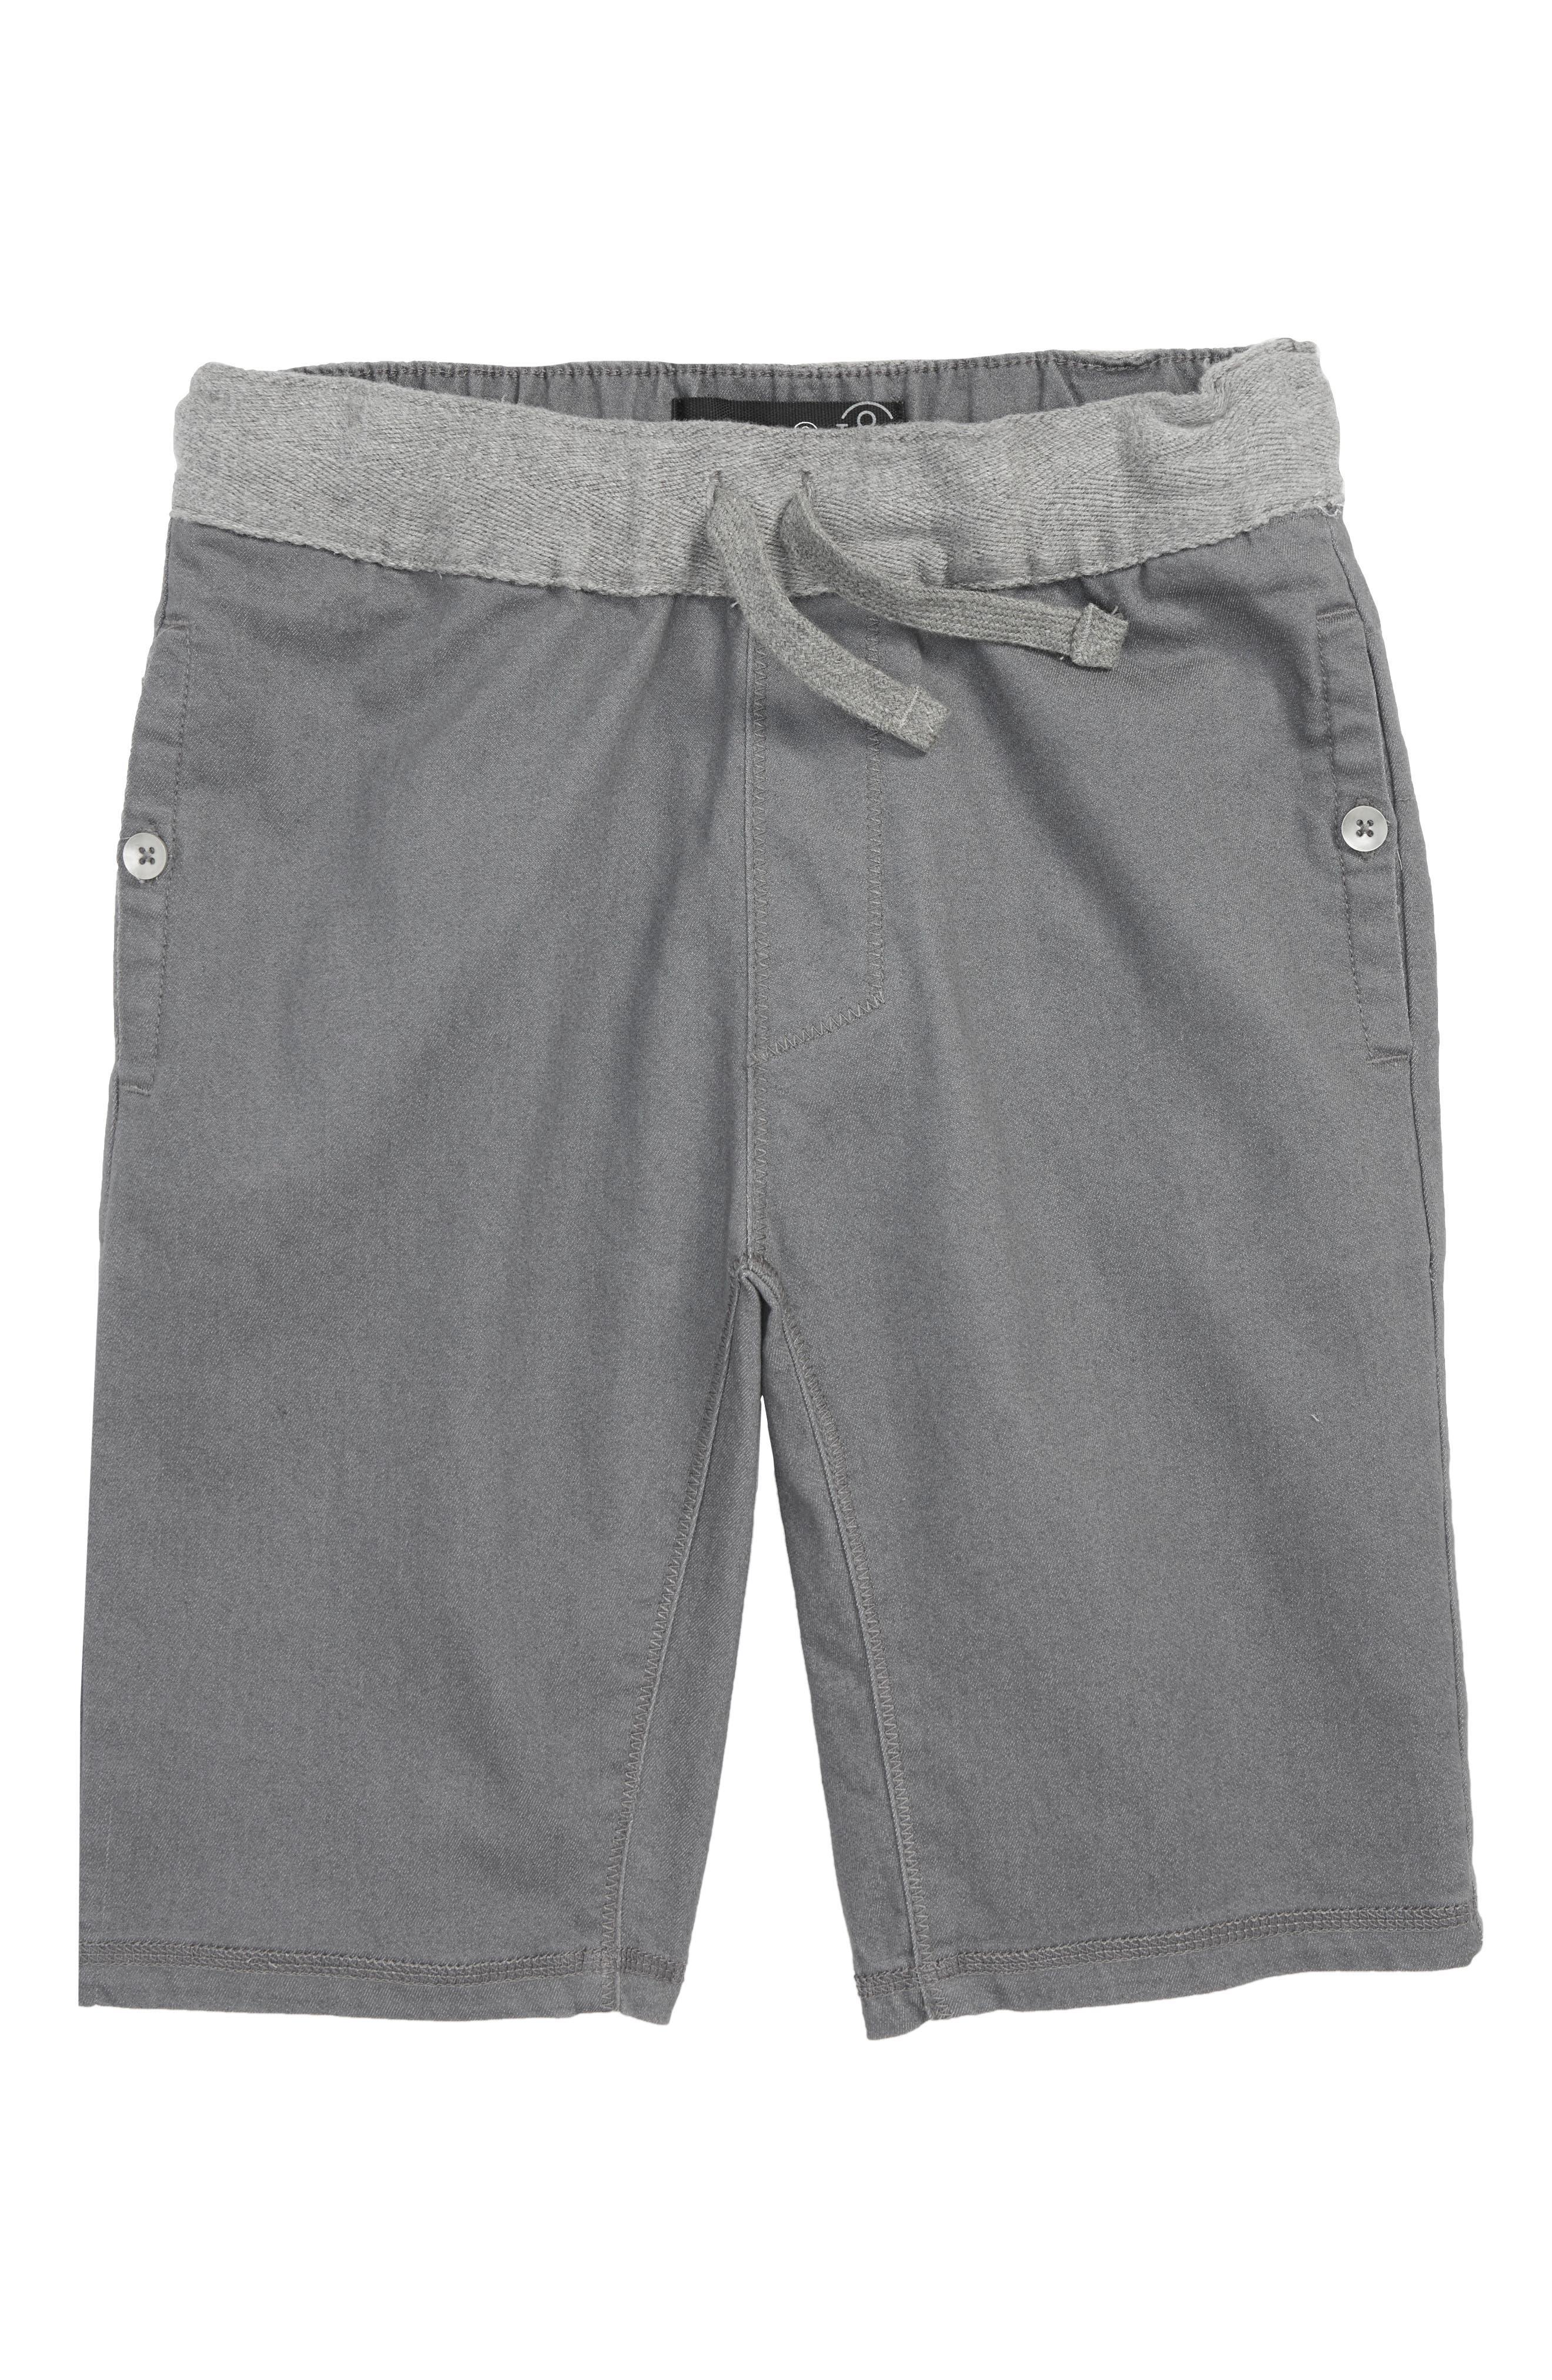 TREASURE & BOND Twill Shorts, Main, color, 021